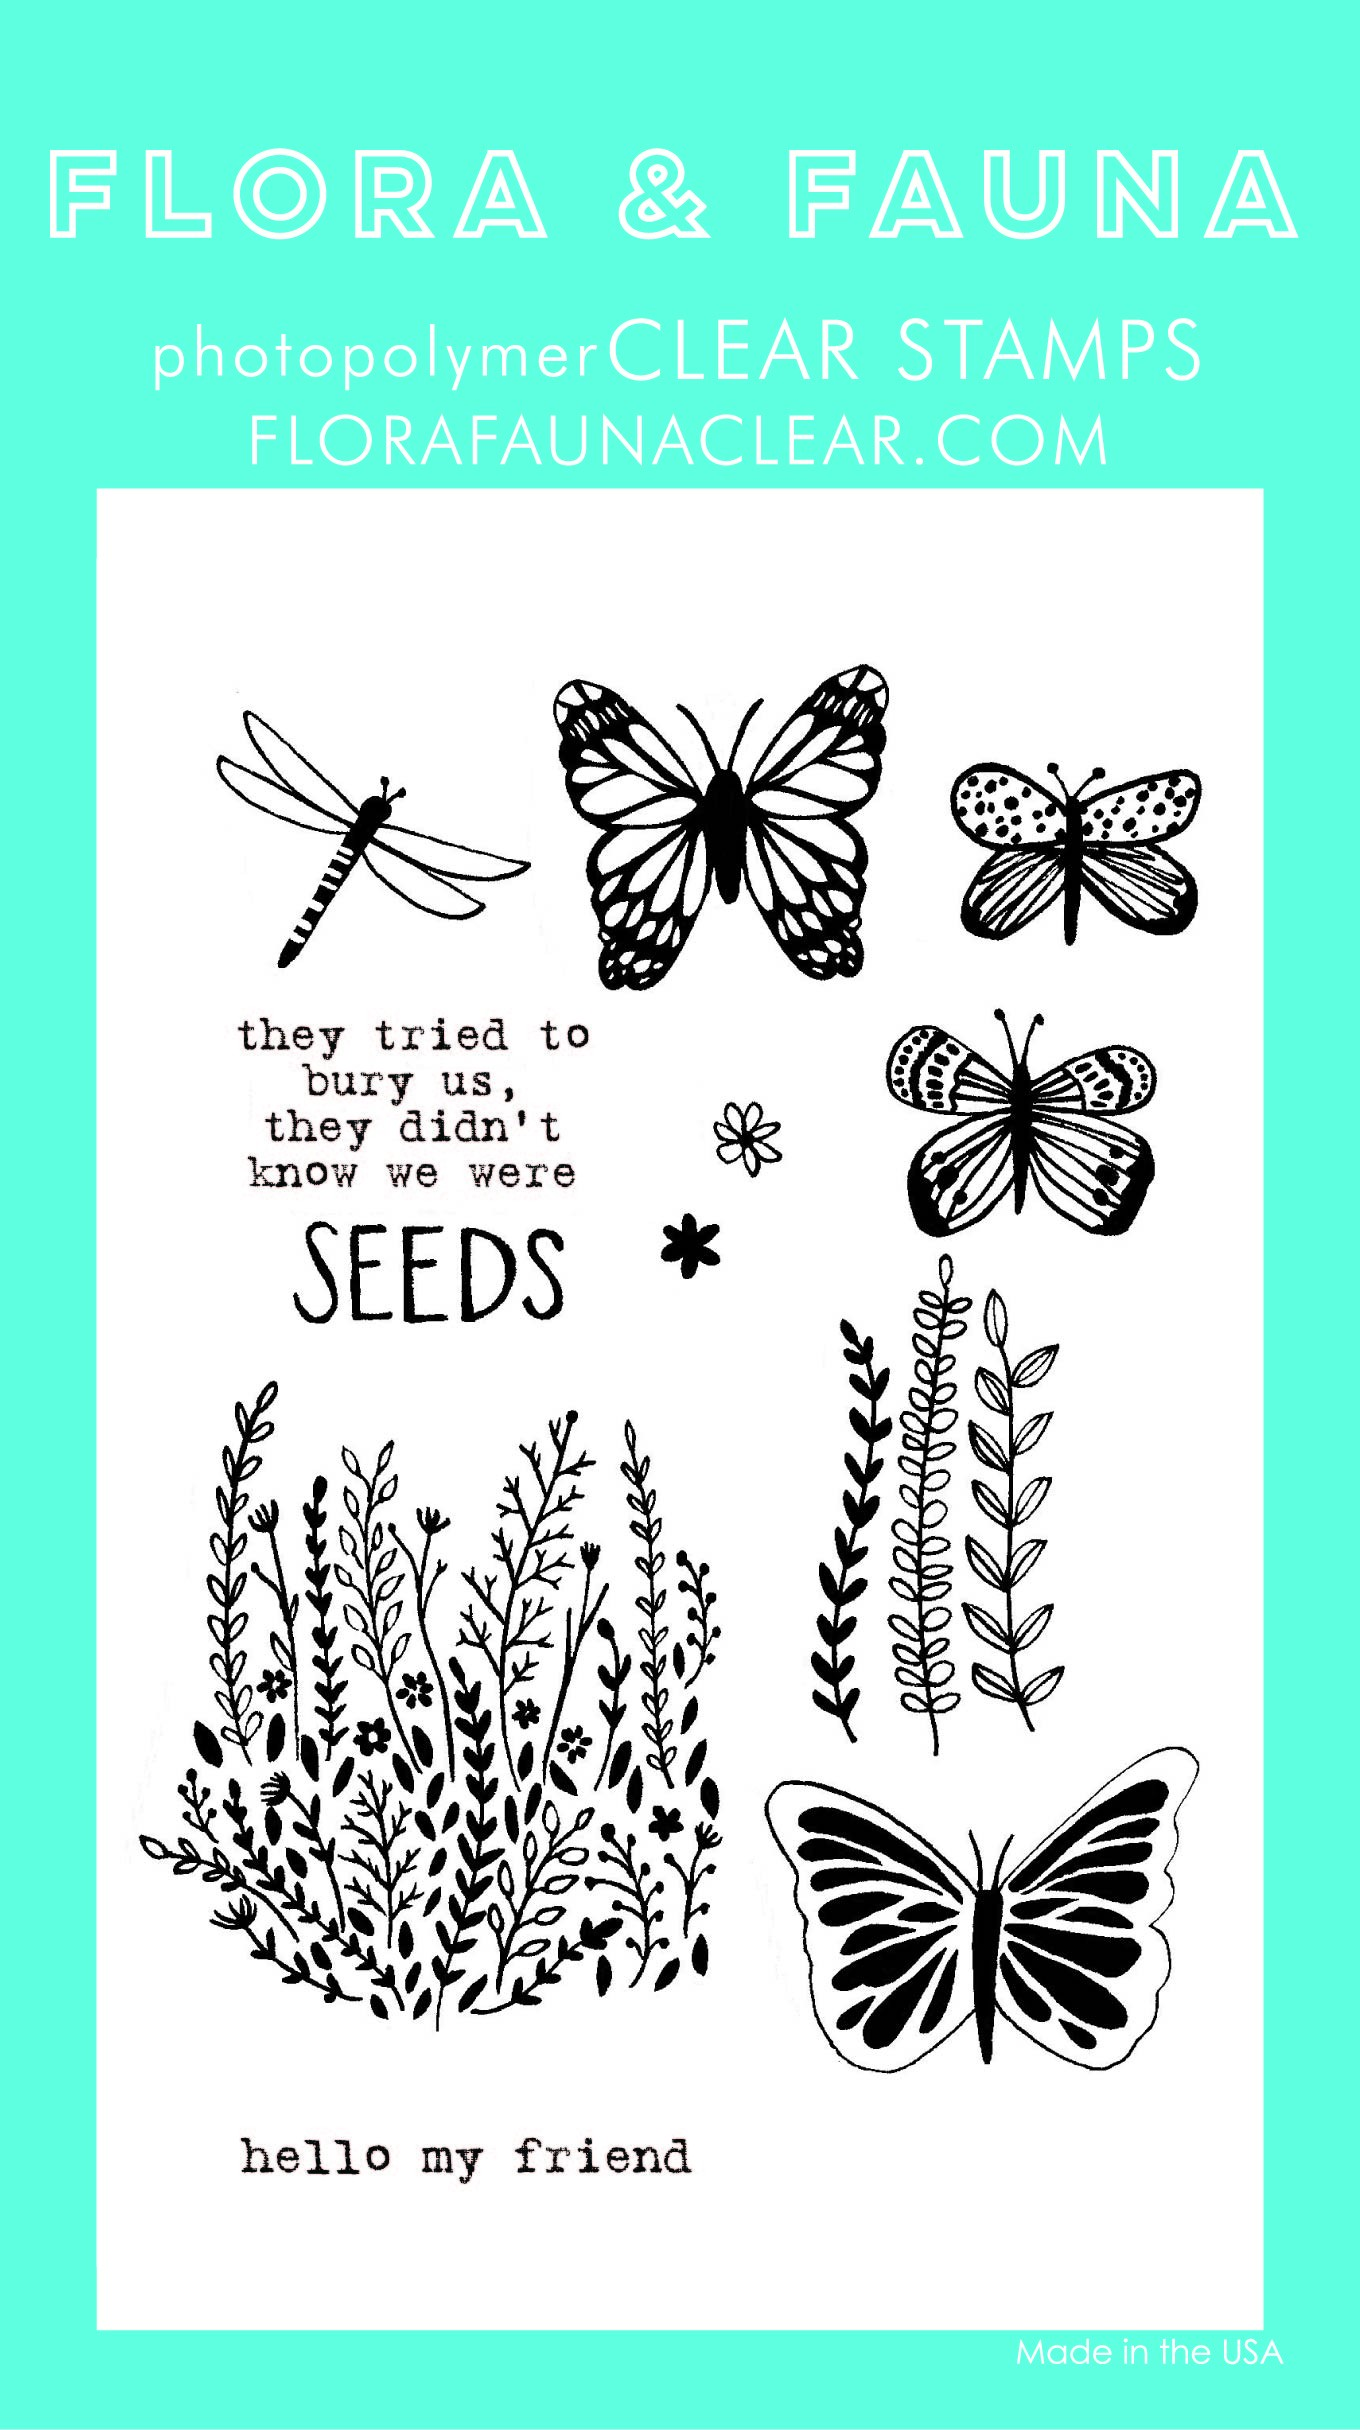 Flora & Fauna Wildflower Seeds Clear Stamp Set